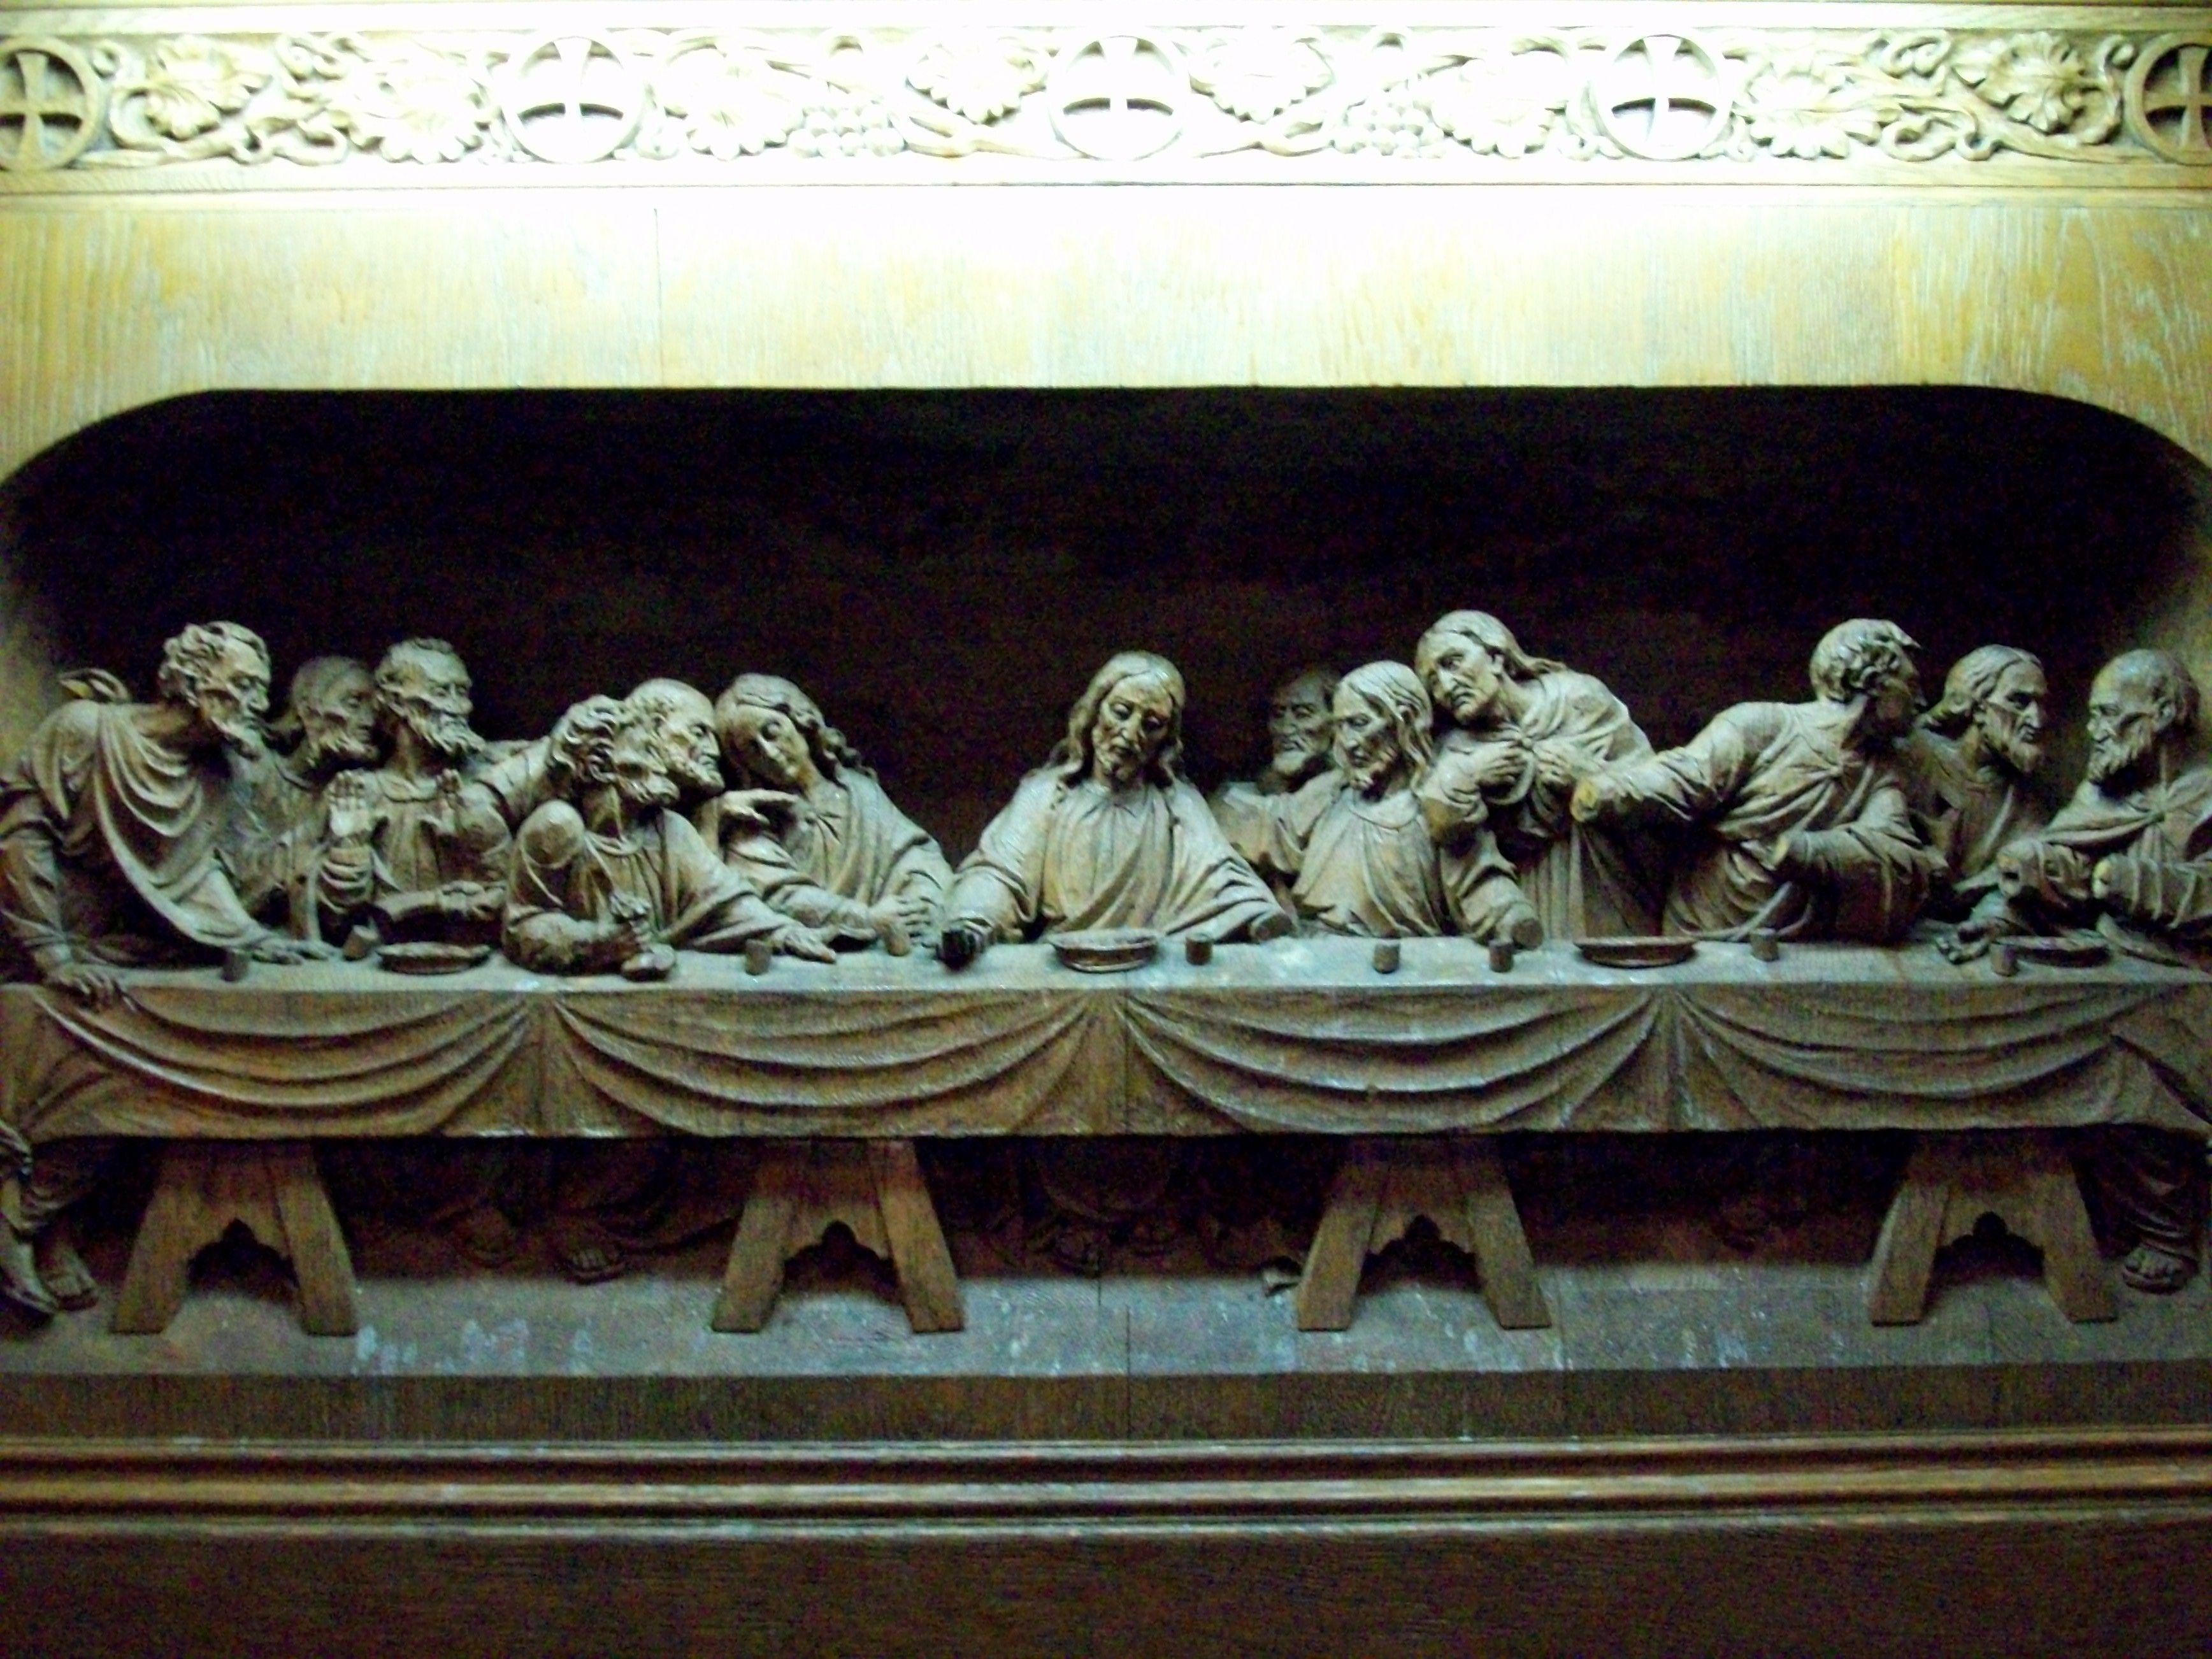 The last supper artwork wood carving (3472x2604, artwork, wood, carving)  via www.allwallpaper.in